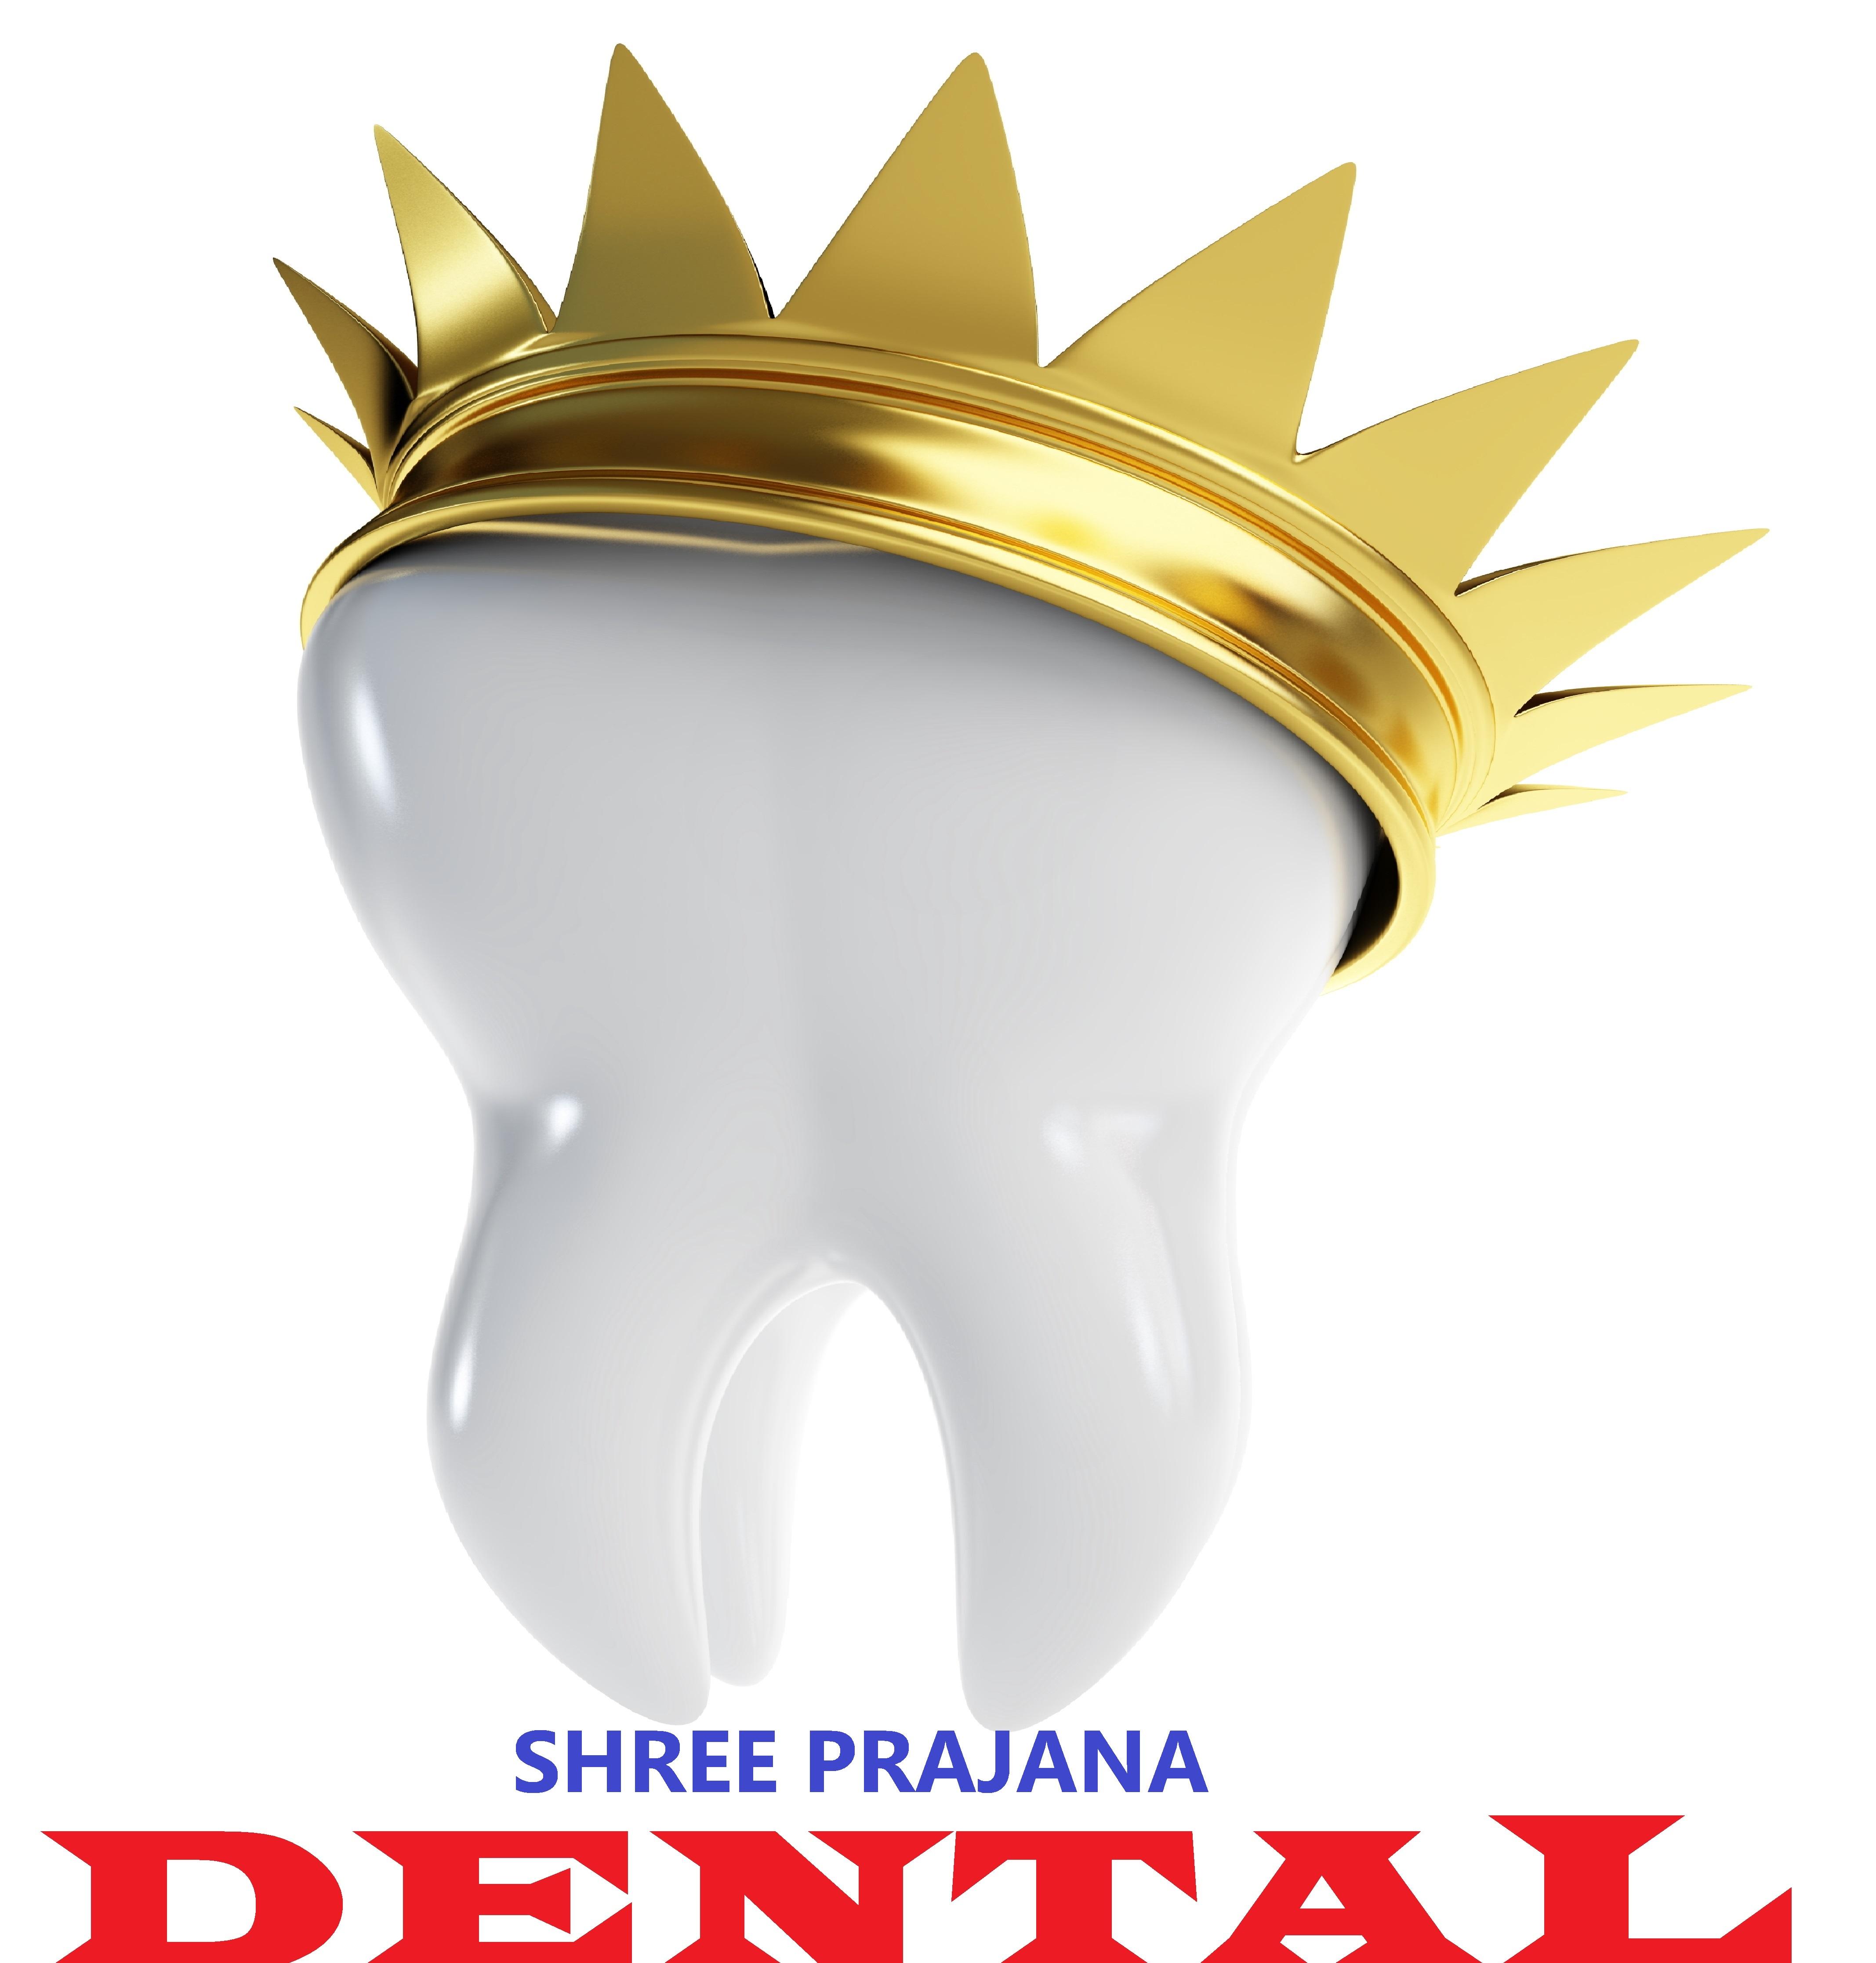 Shree Prajana Superspeciality Dental Hospital, Root Canal & Implant Centre